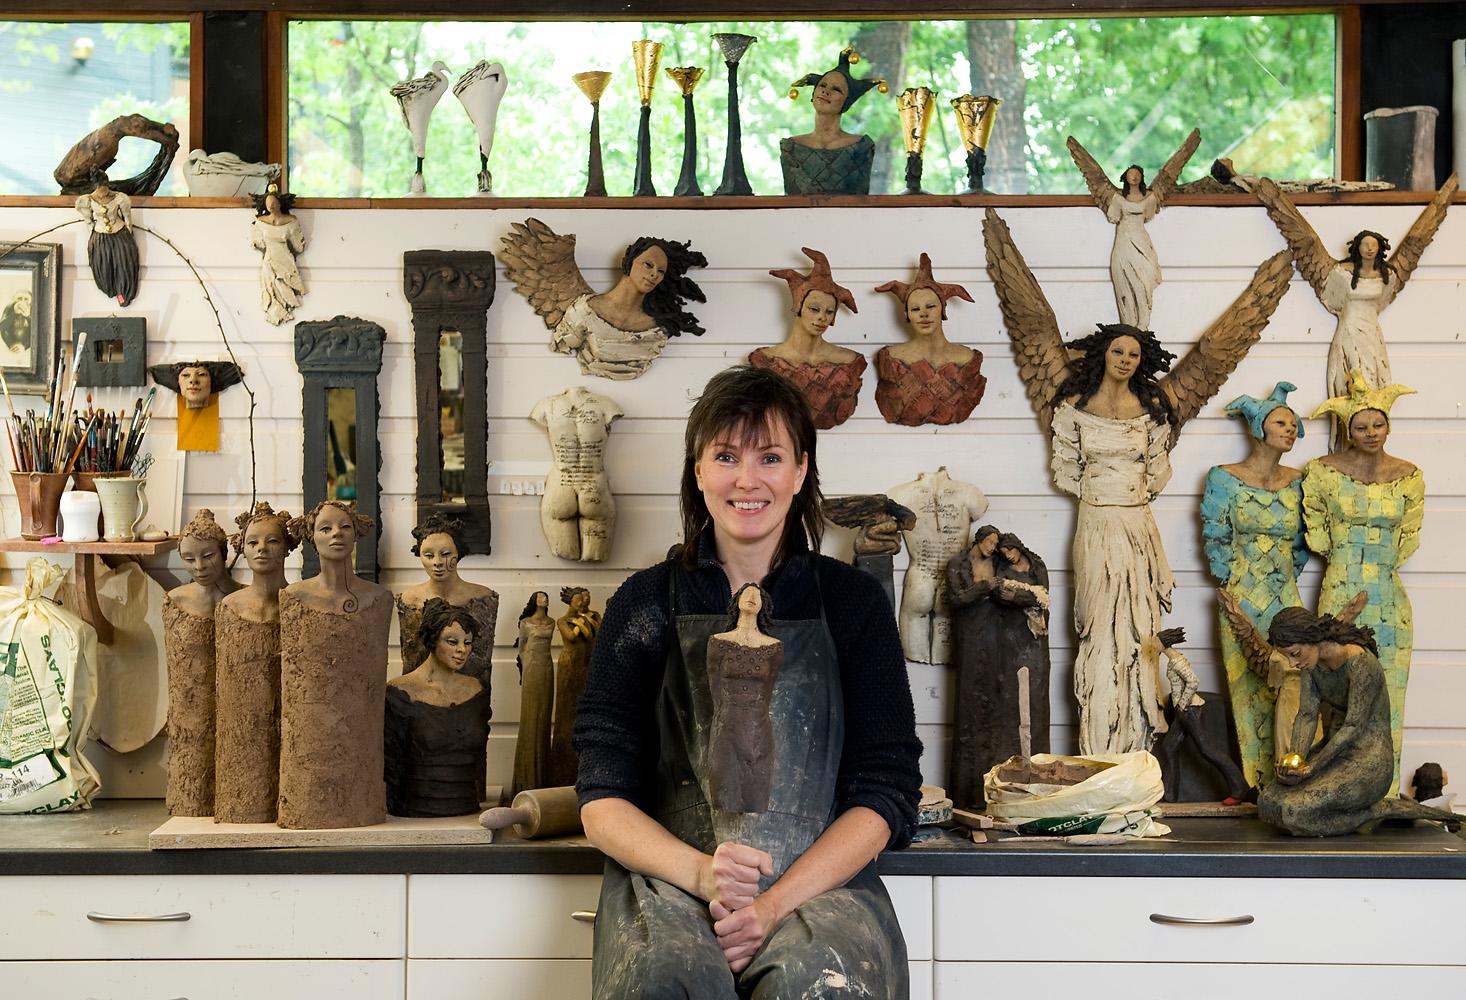 I verkstedet, Ingun Dahlin, keramikk, skulptur, verksted